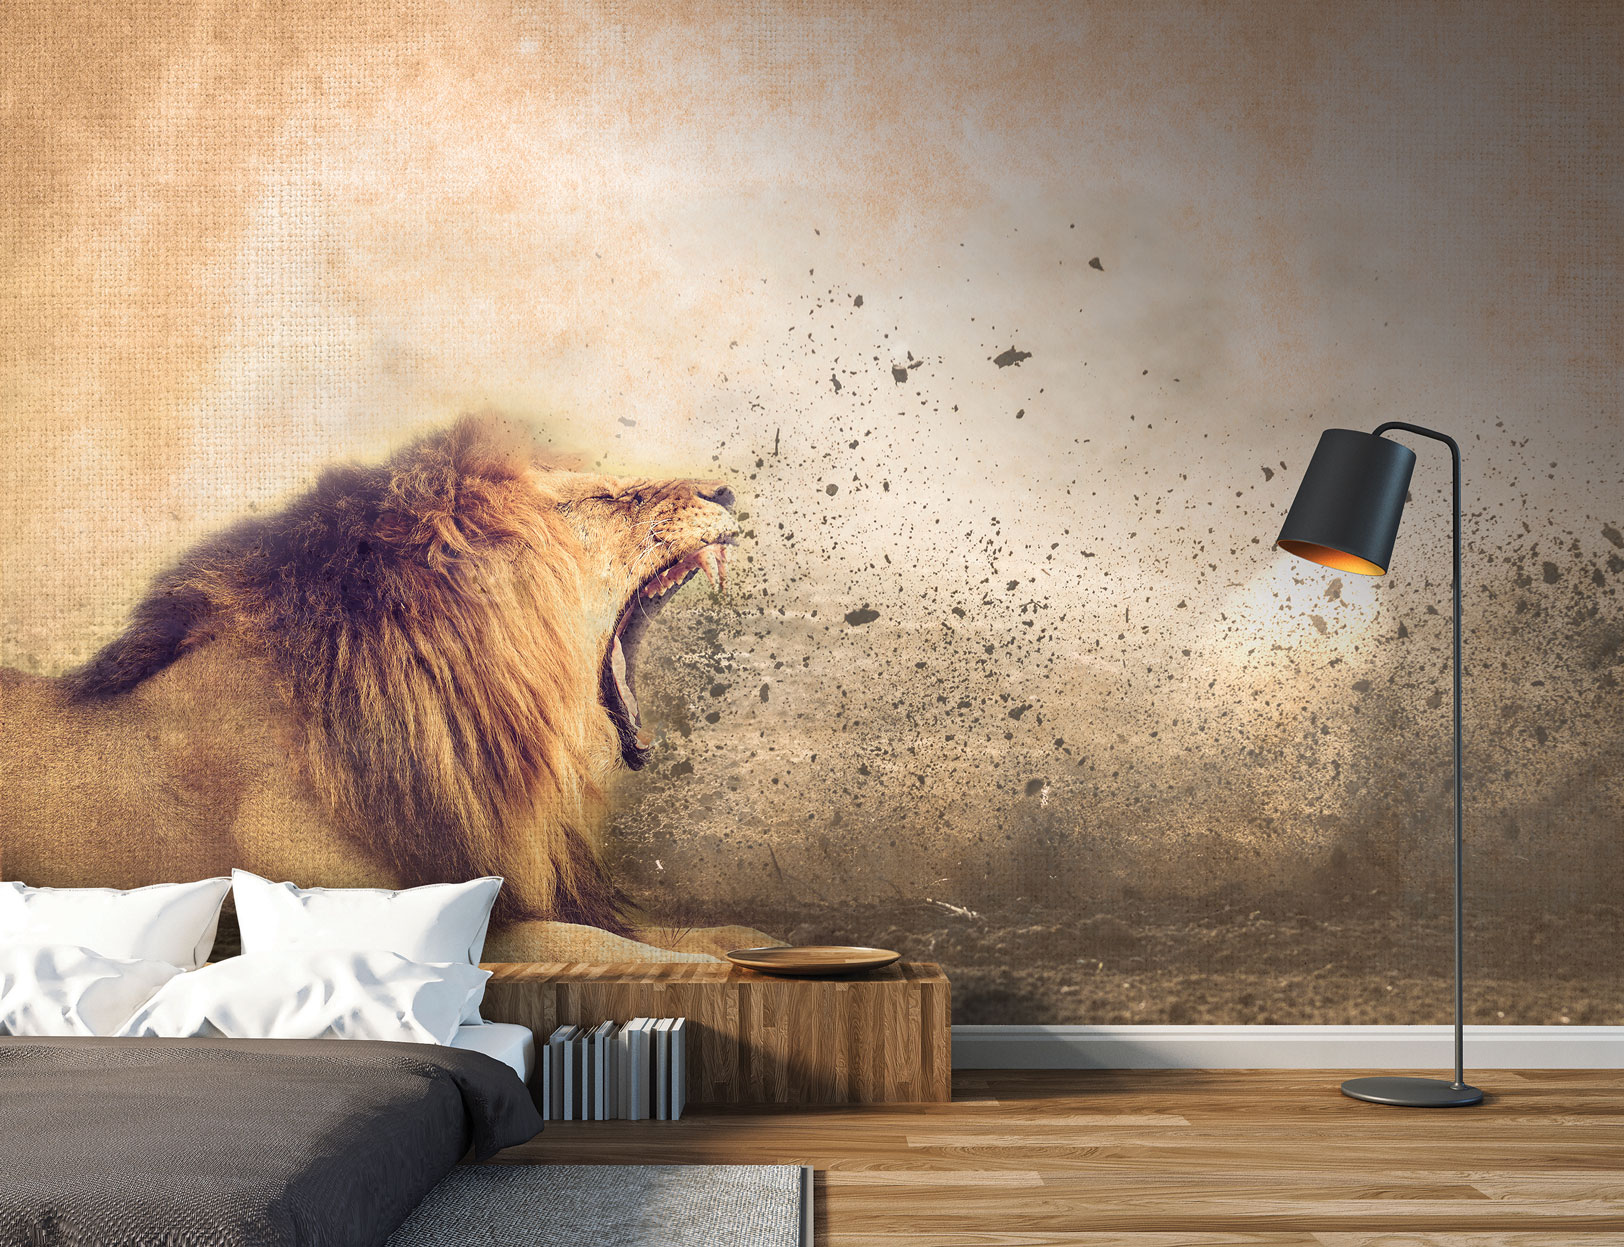 news-2018—roar-of-the-lion-amb